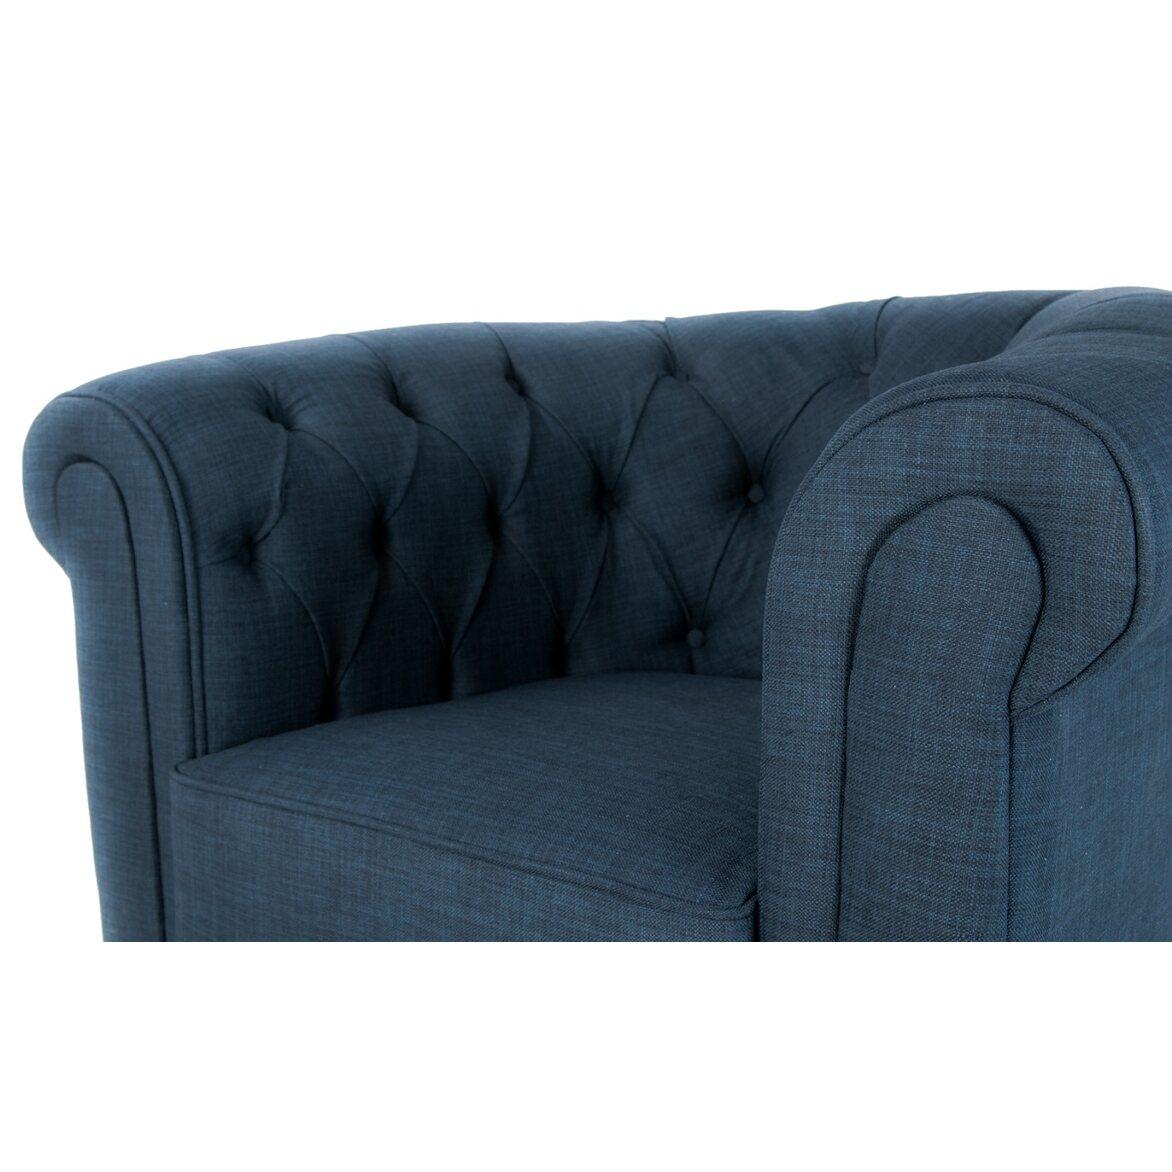 Кресло Nala blue 4 | Каминные кресла Kingsby